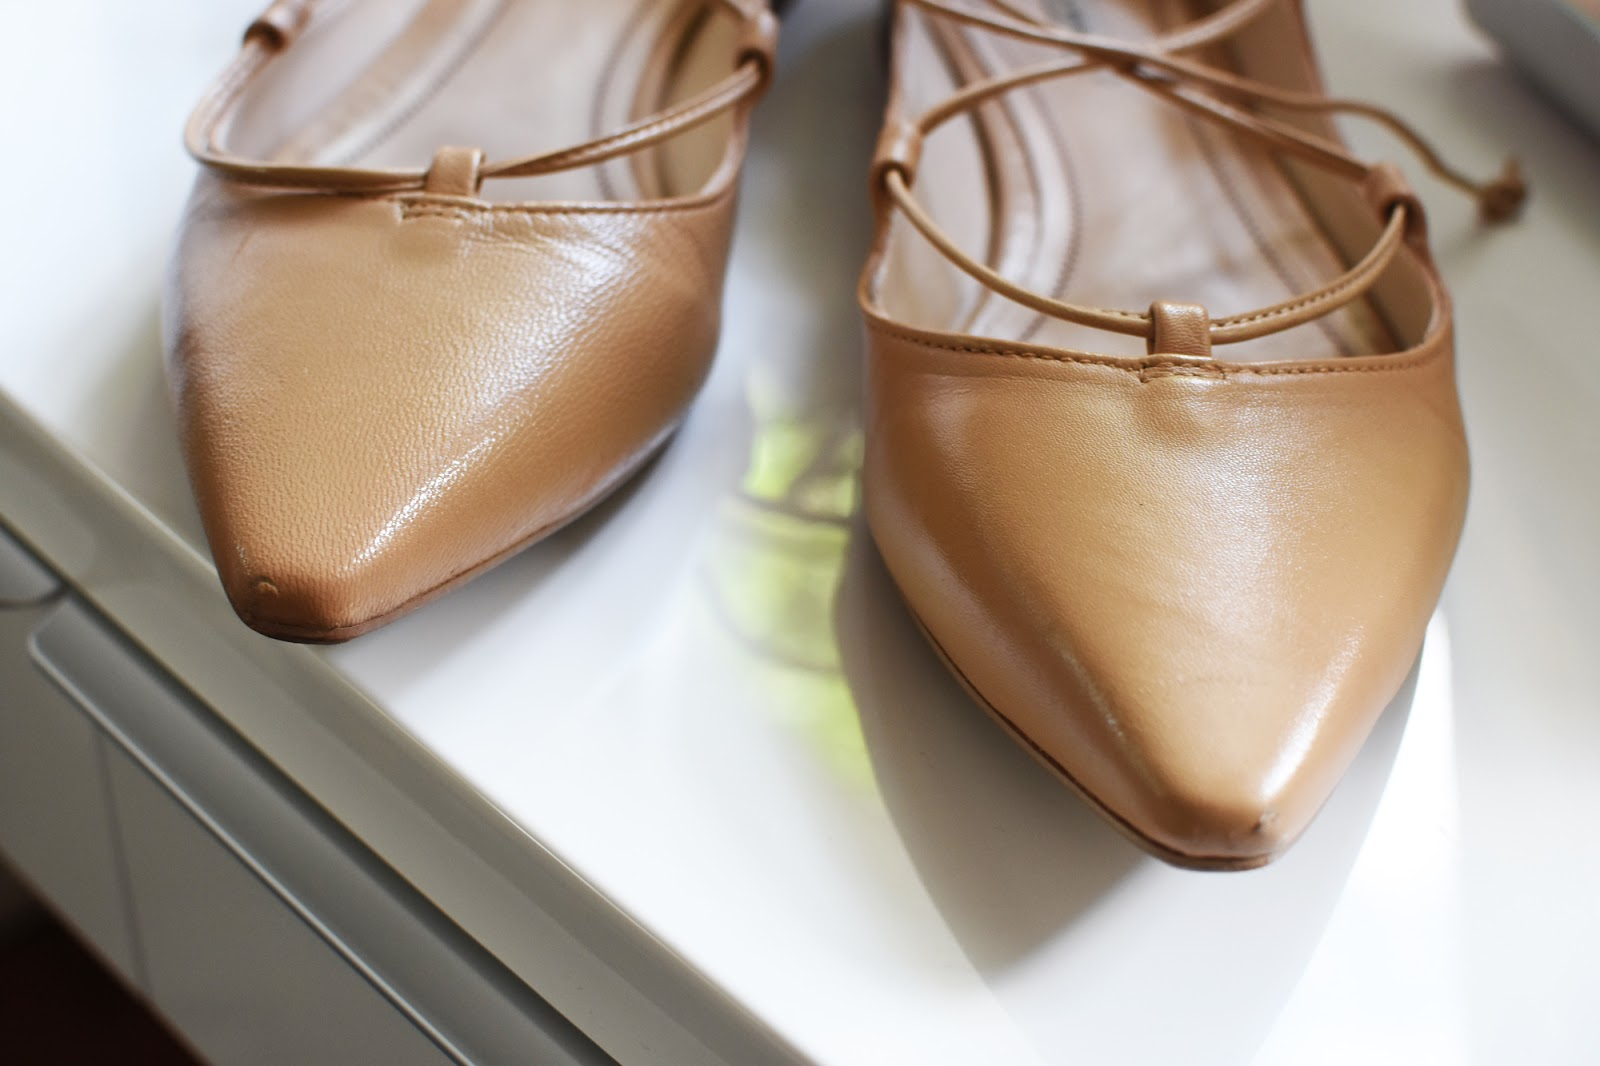 Zara nude tie up leather ballerina flats, Aquazzura Christy dupes.